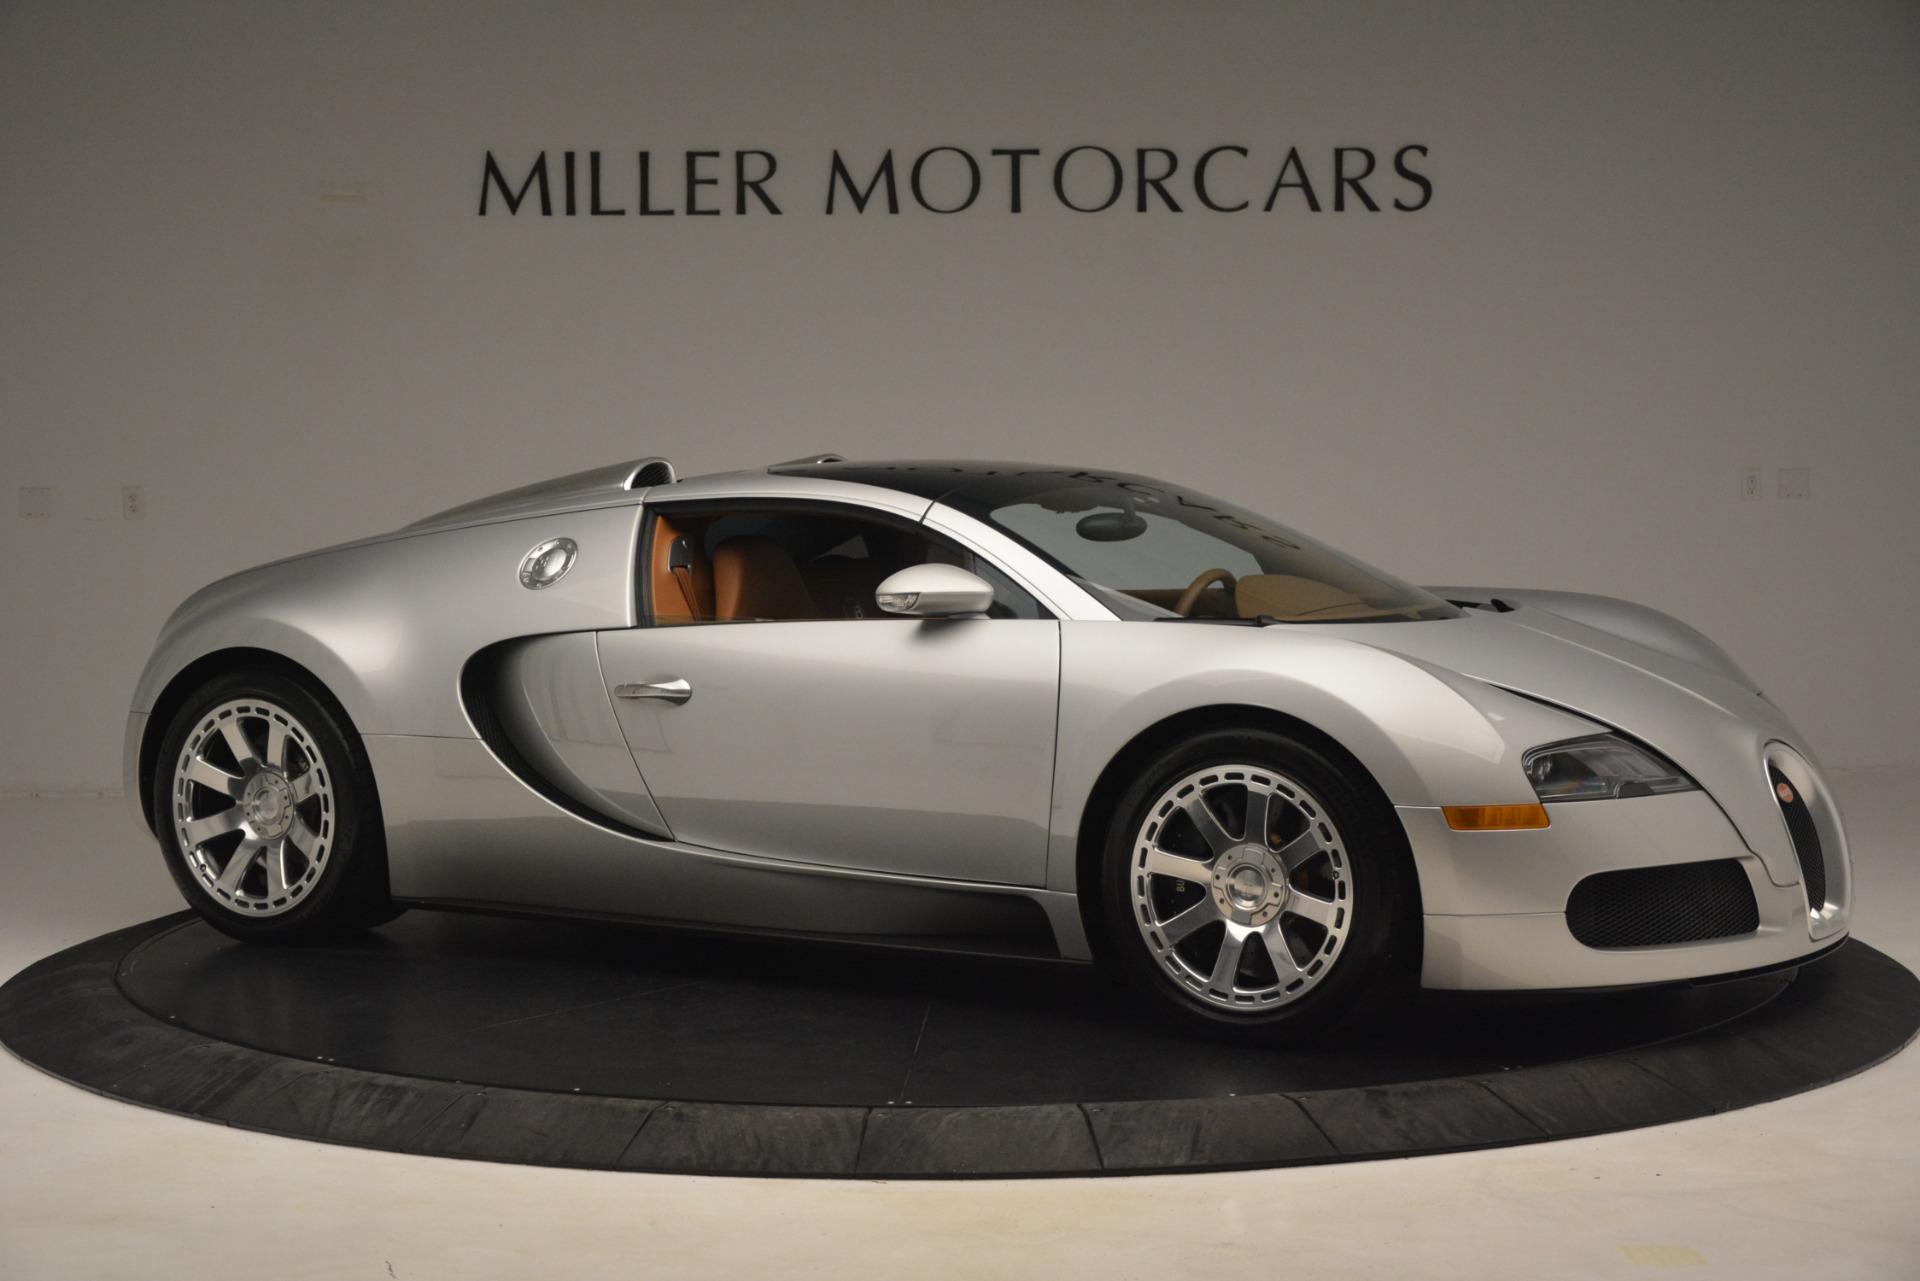 Used 2010 Bugatti Veyron 16.4 Grand Sport For Sale In Greenwich, CT 3159_p20